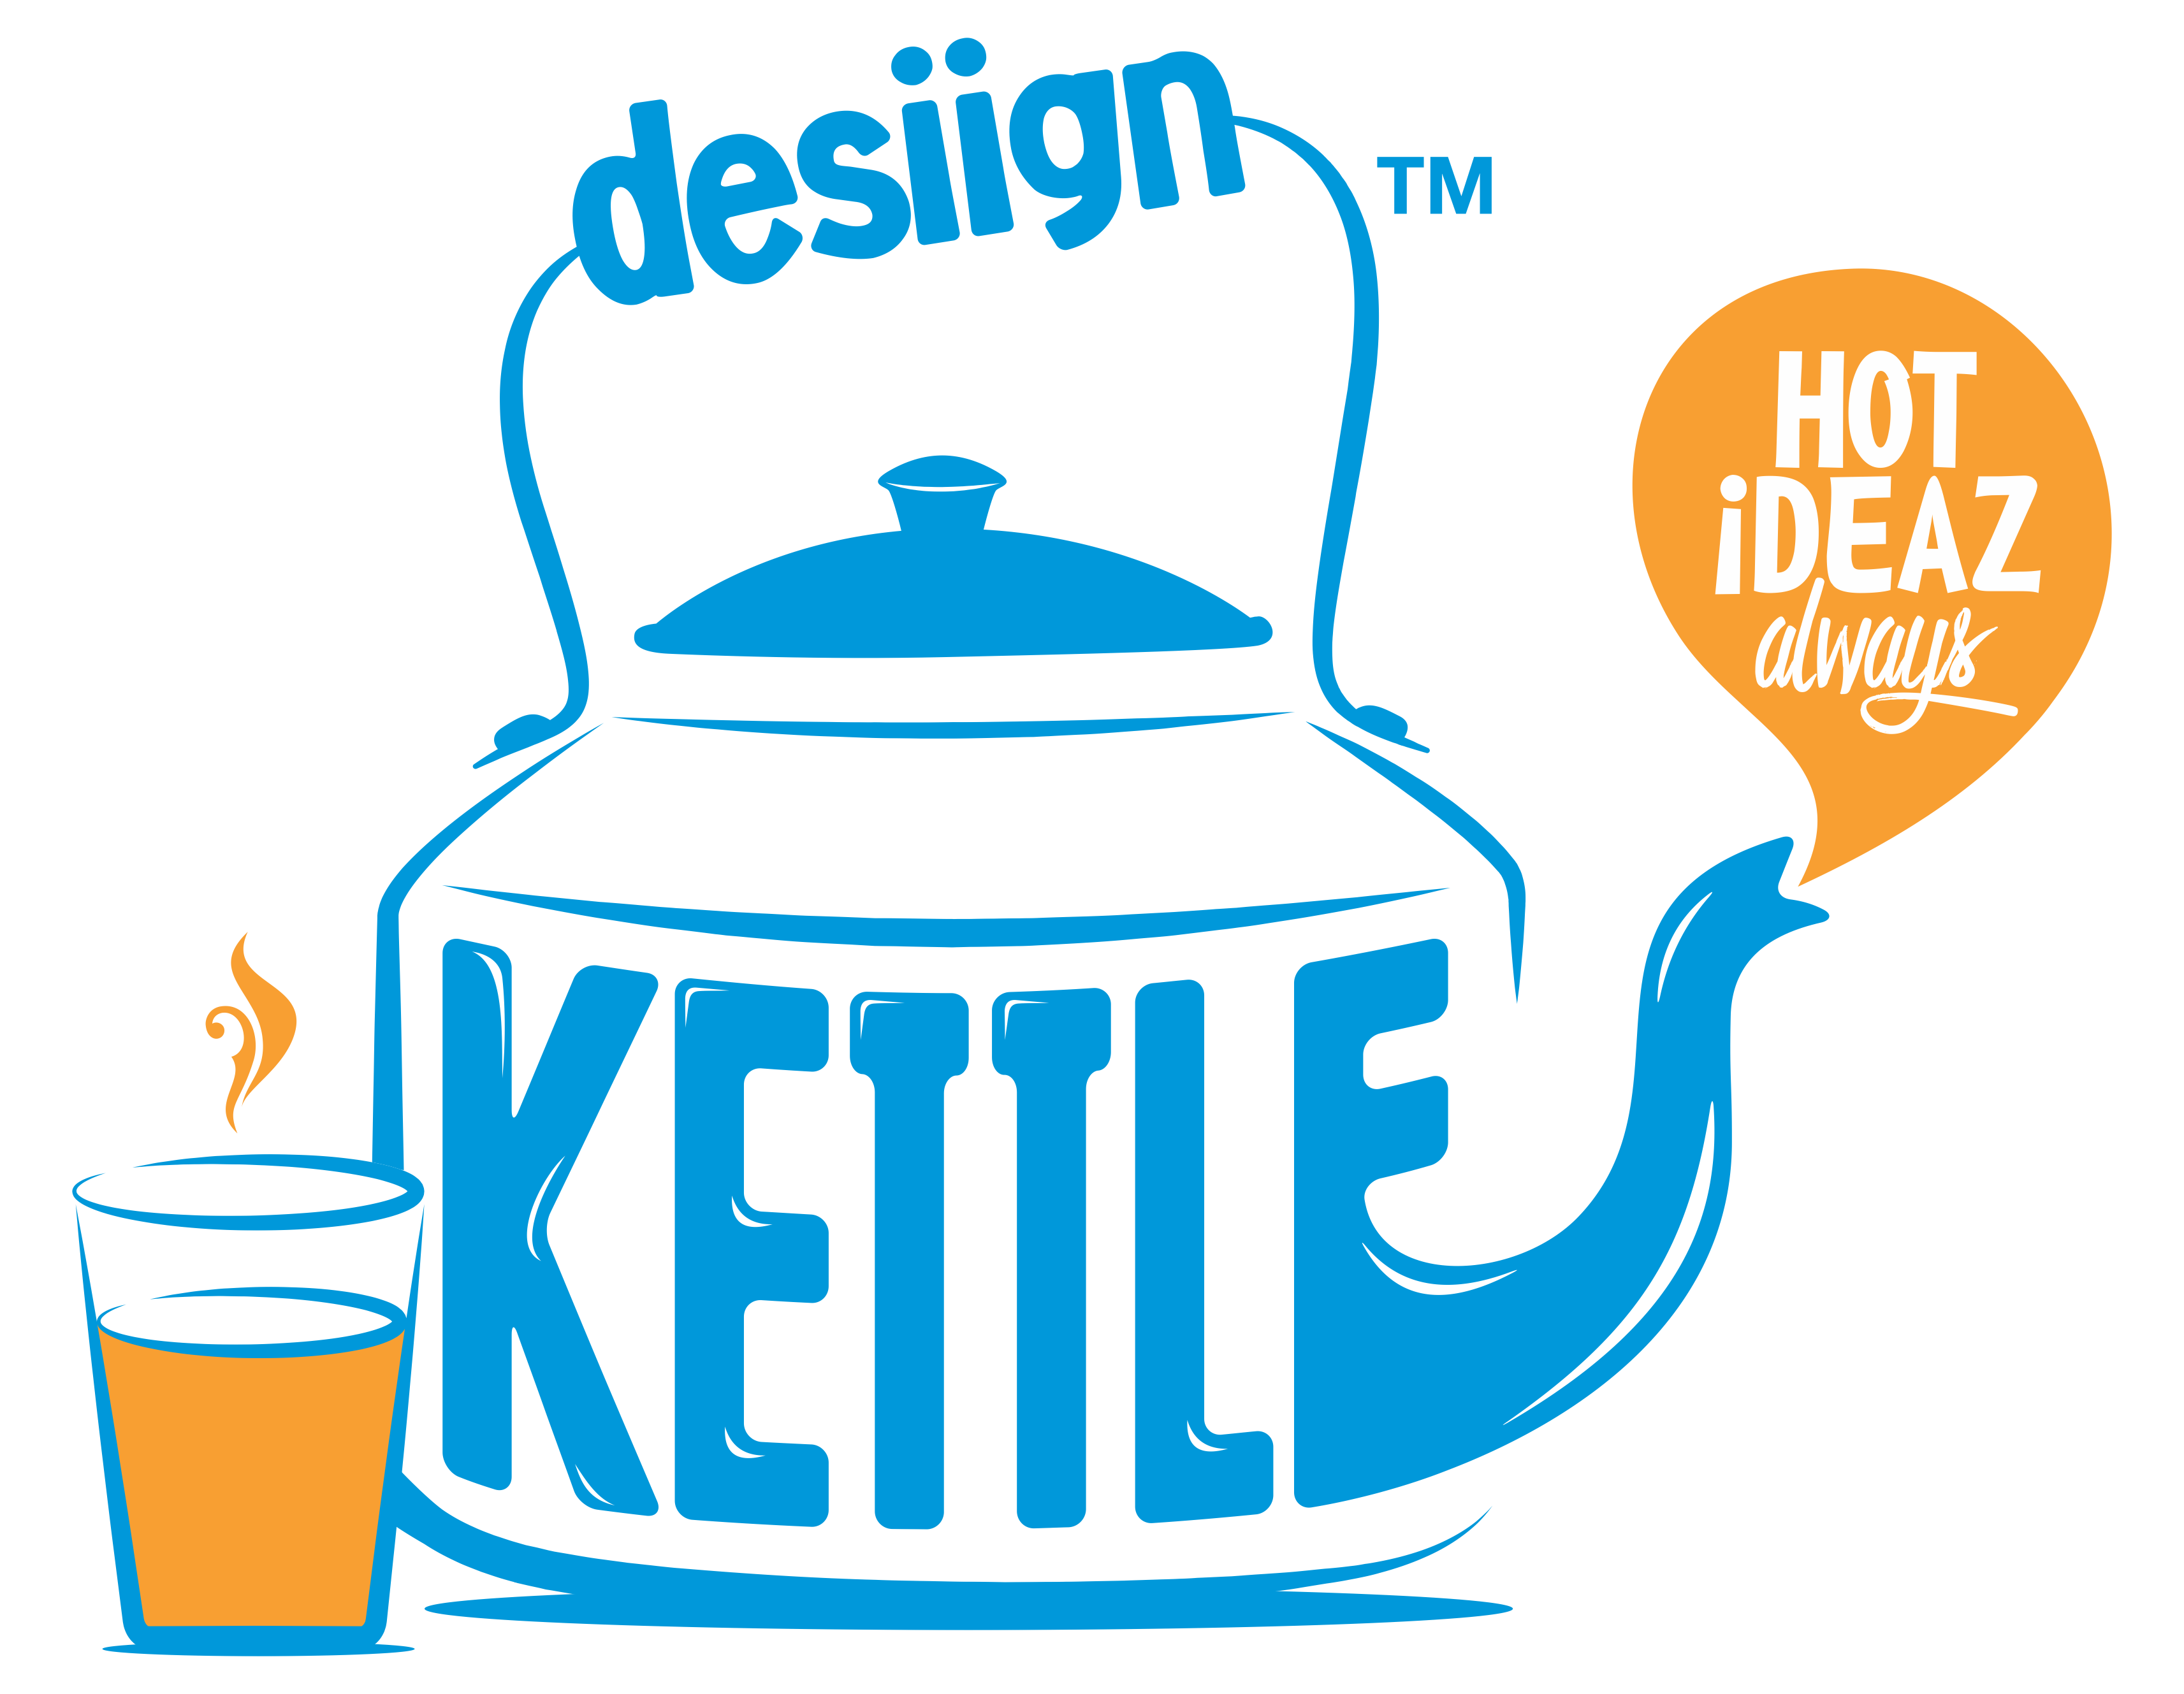 Design Kettle